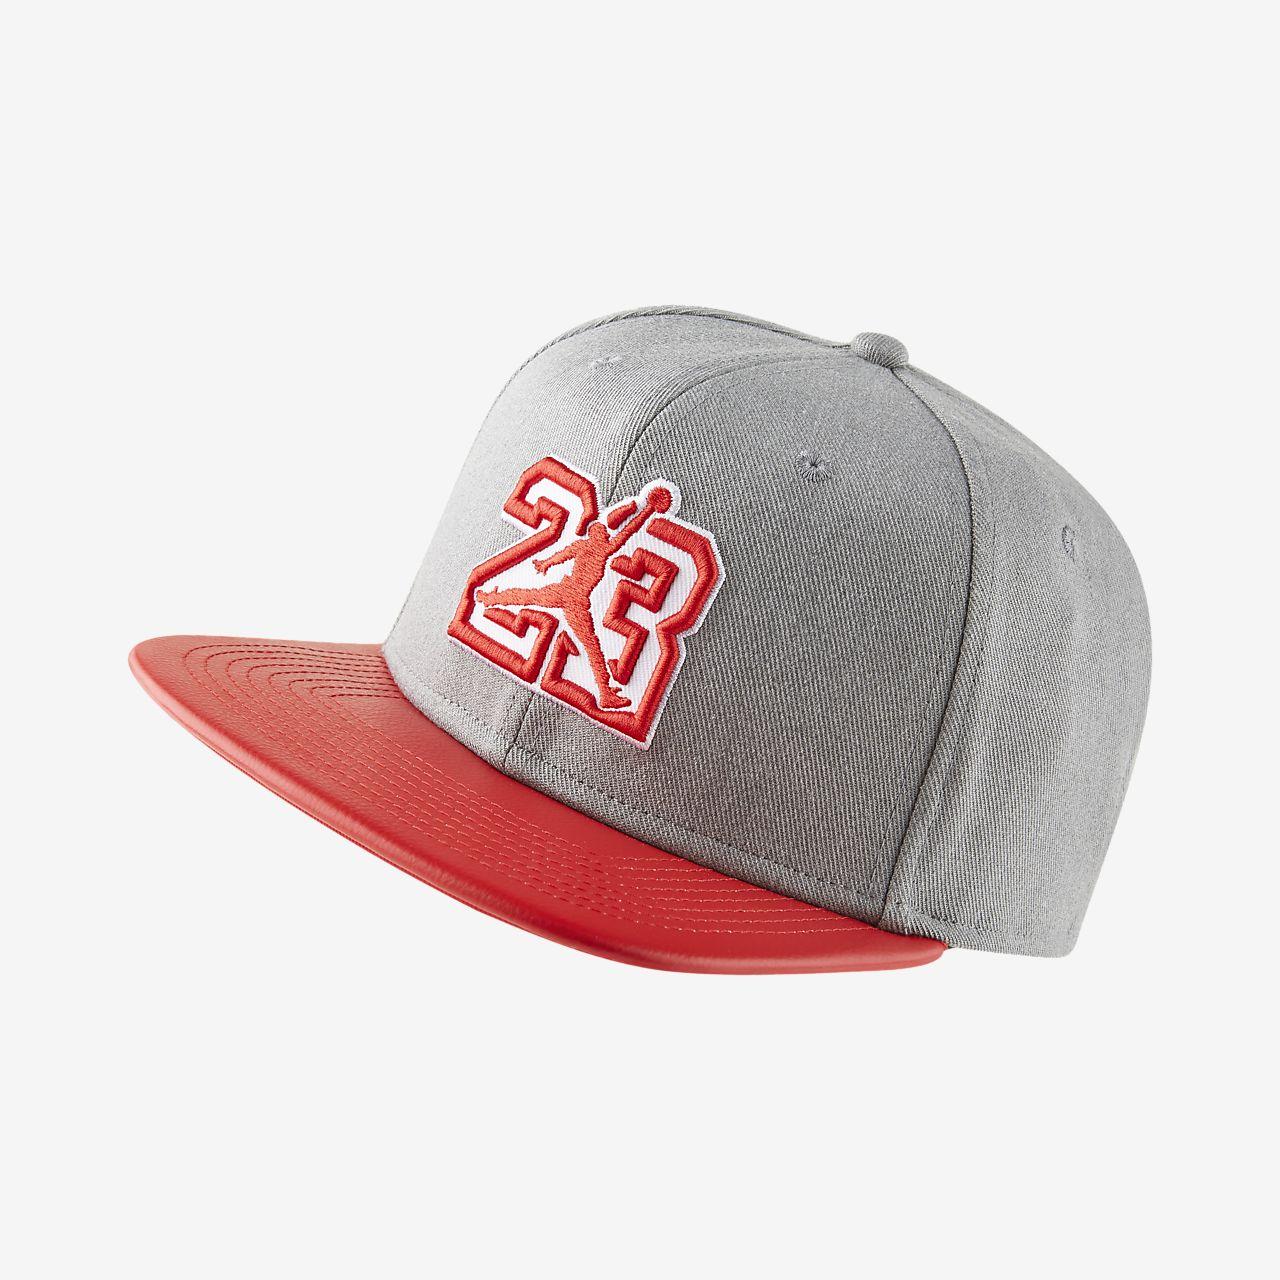 aed0d324774 ... low price jordan pro he got game xiii adjustable hat d0e23 b60c7